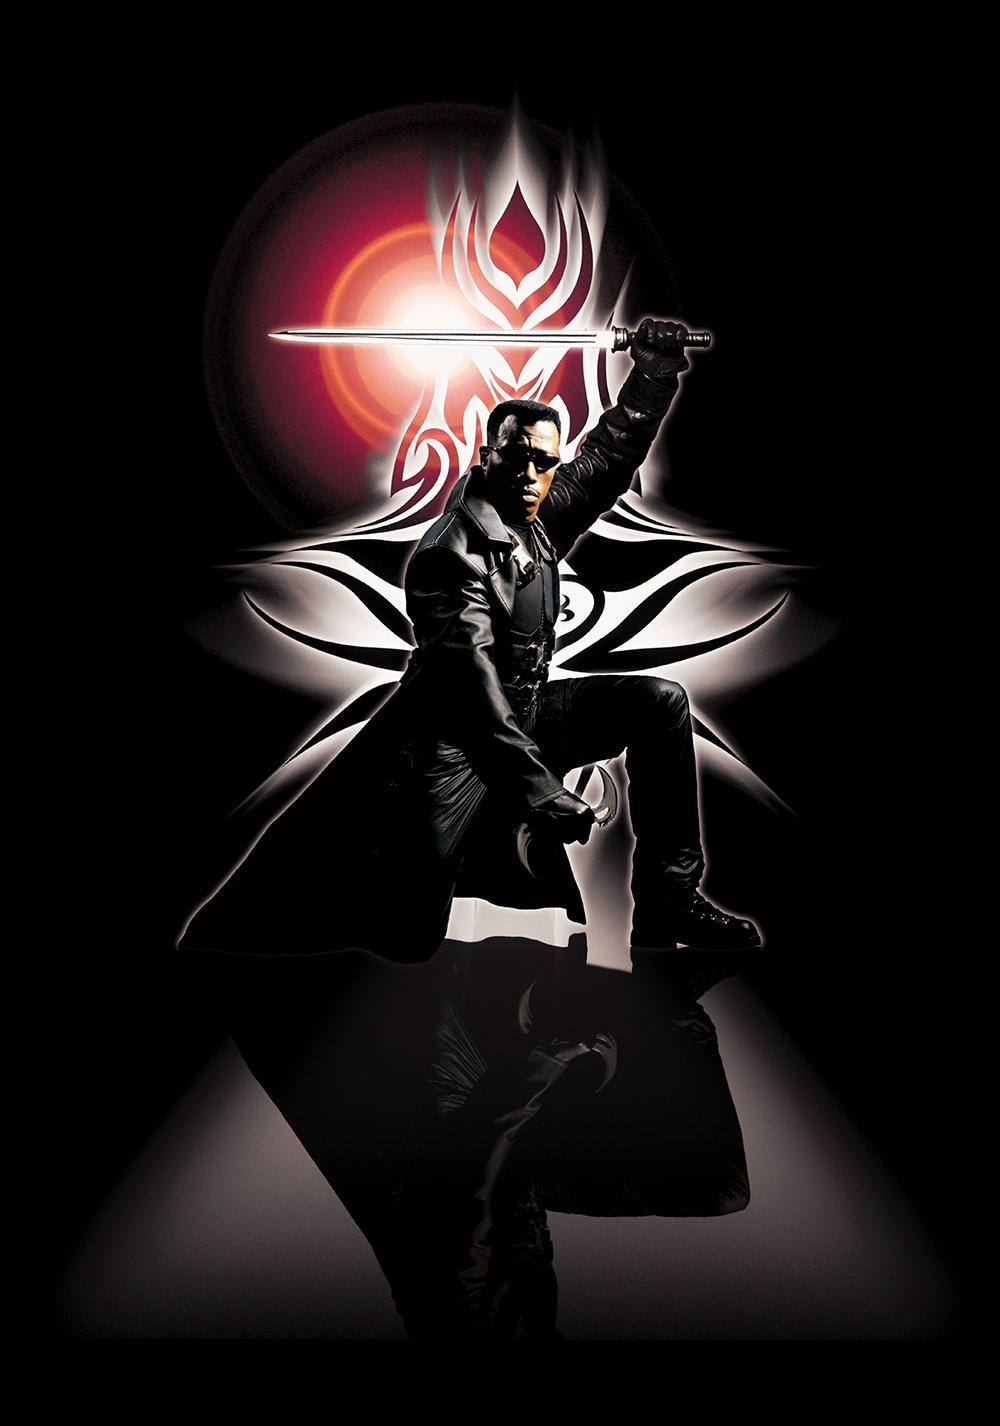 Wesley Snipes como Blade en Blade (1998). Imagen: fanart.tv